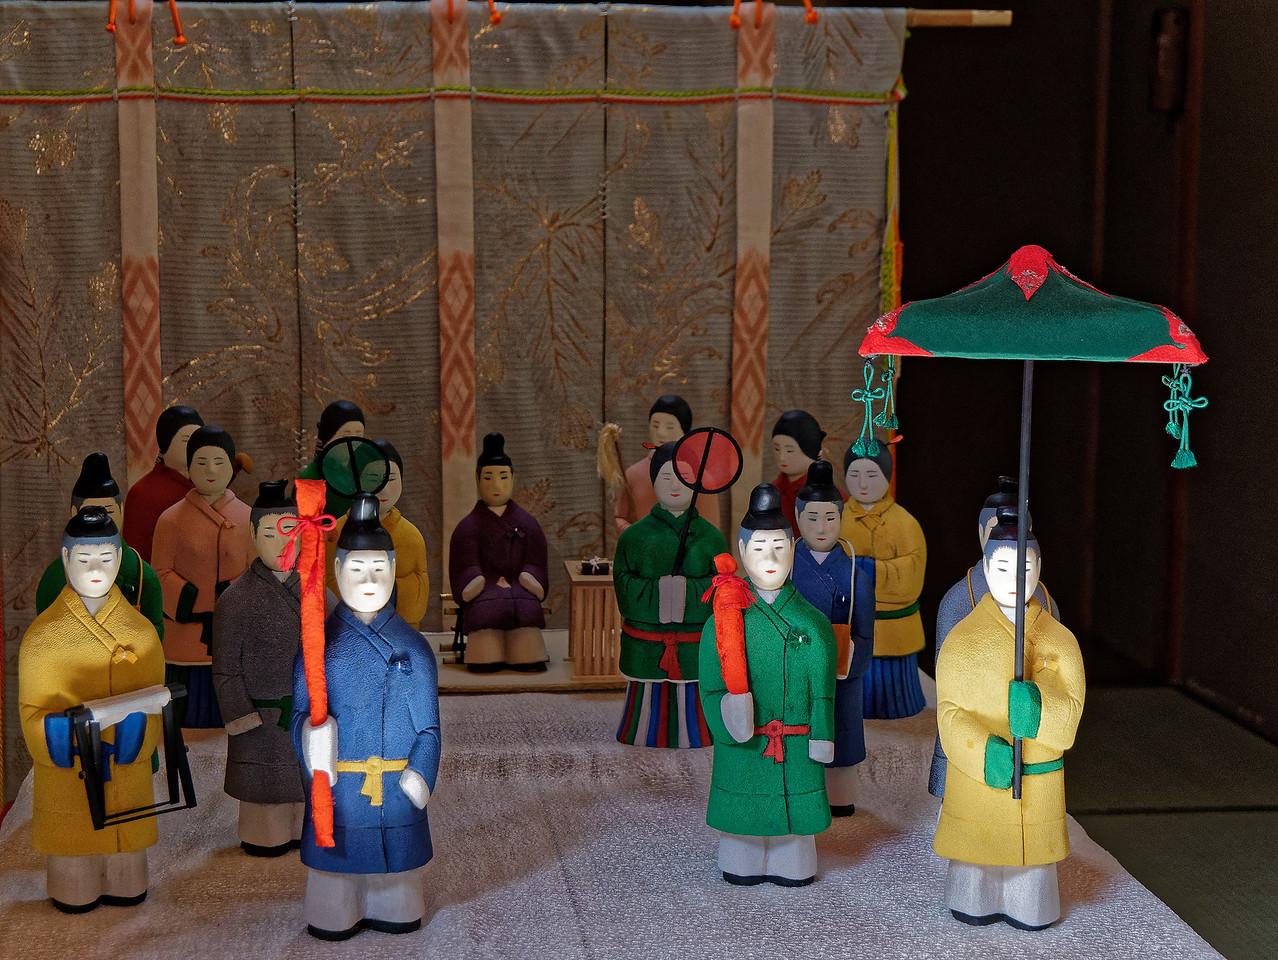 A miniature shrine within the shrine